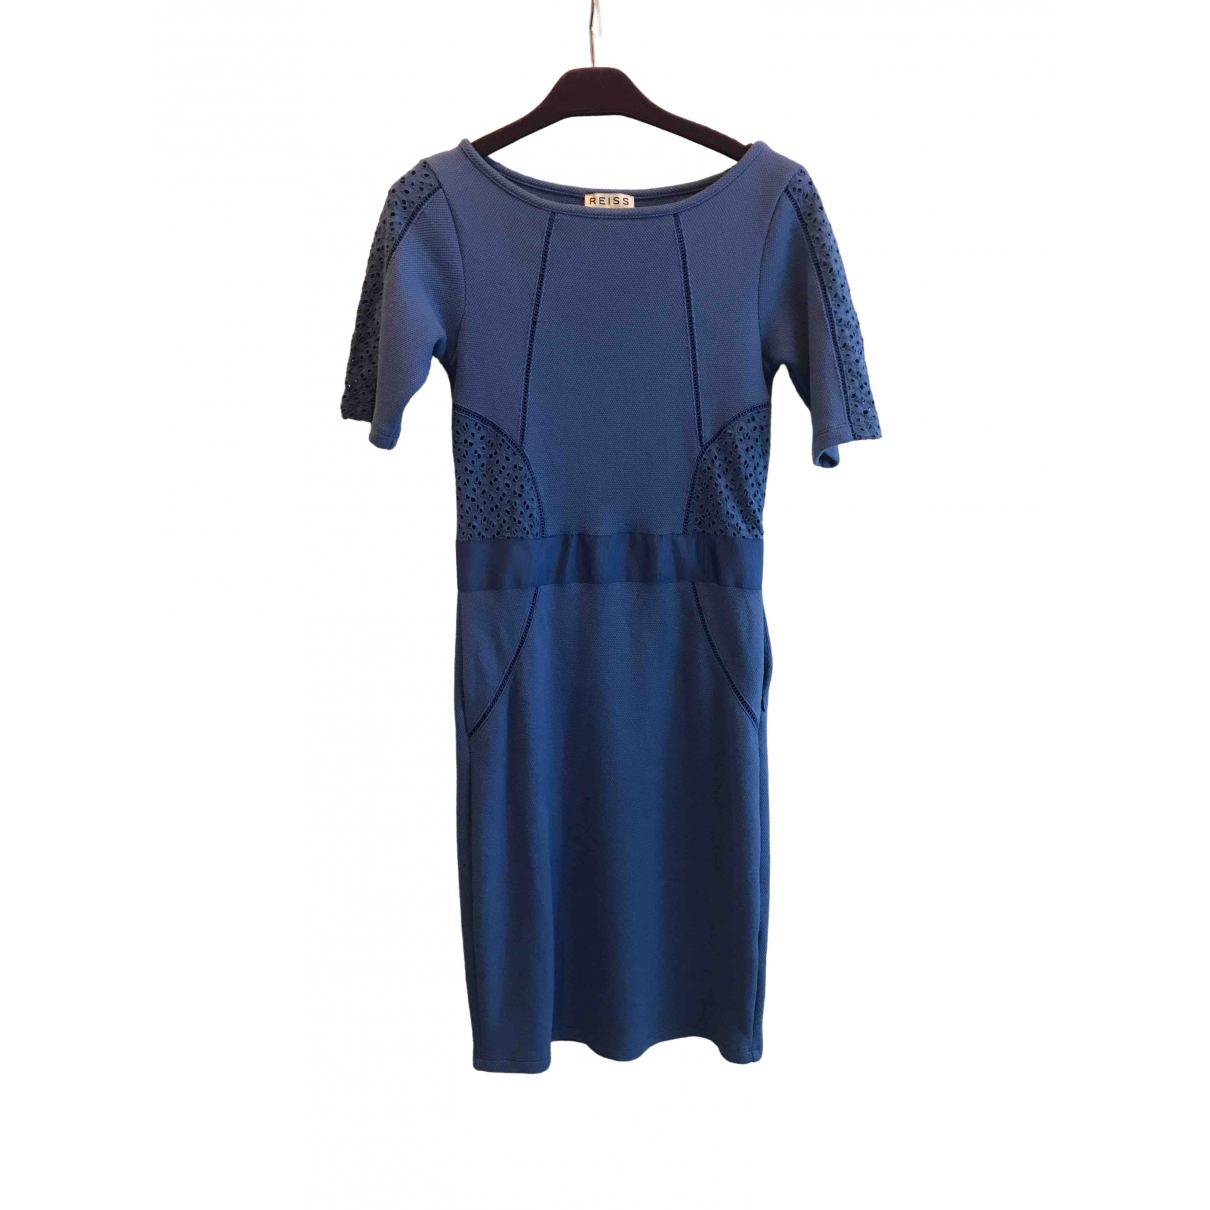 Reiss \N Blue Cotton dress for Women 6 UK